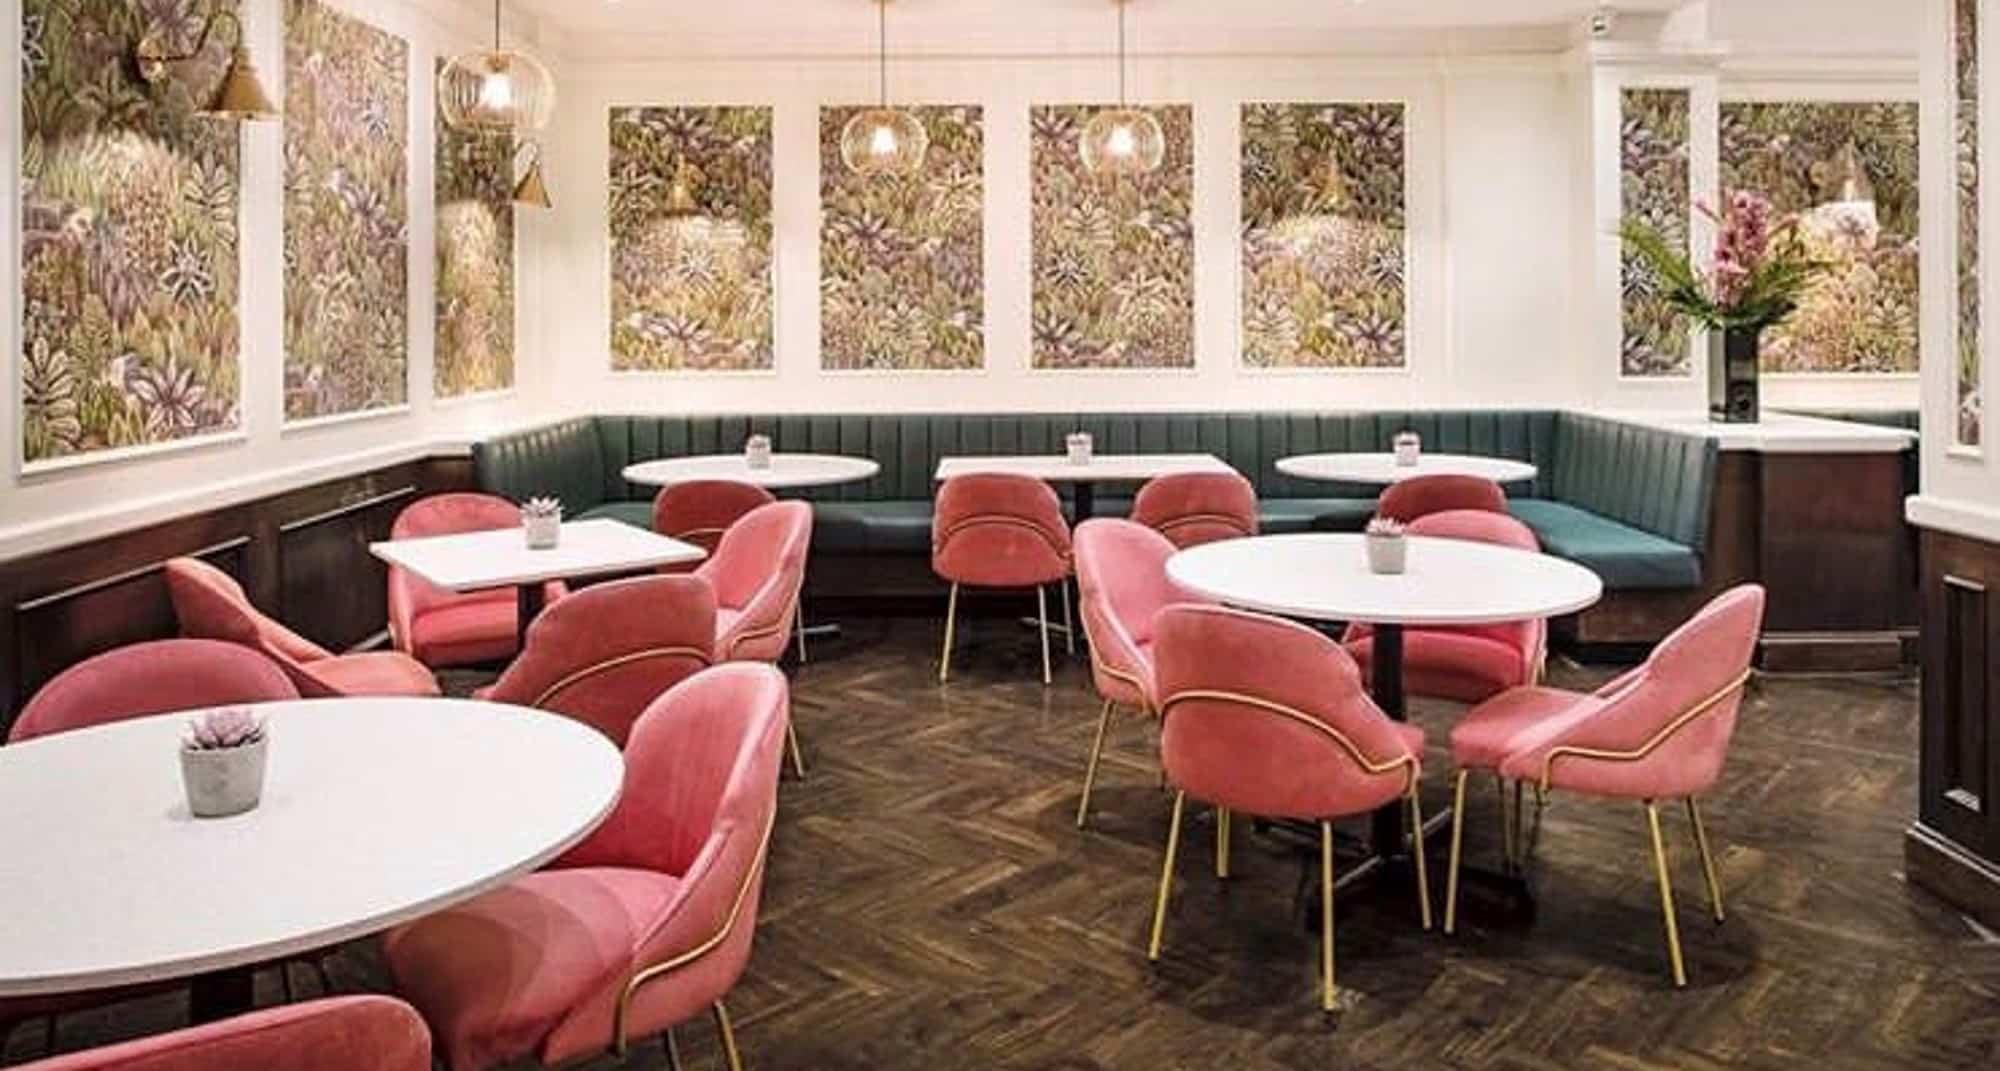 Restaurant Furniture By Defrae London